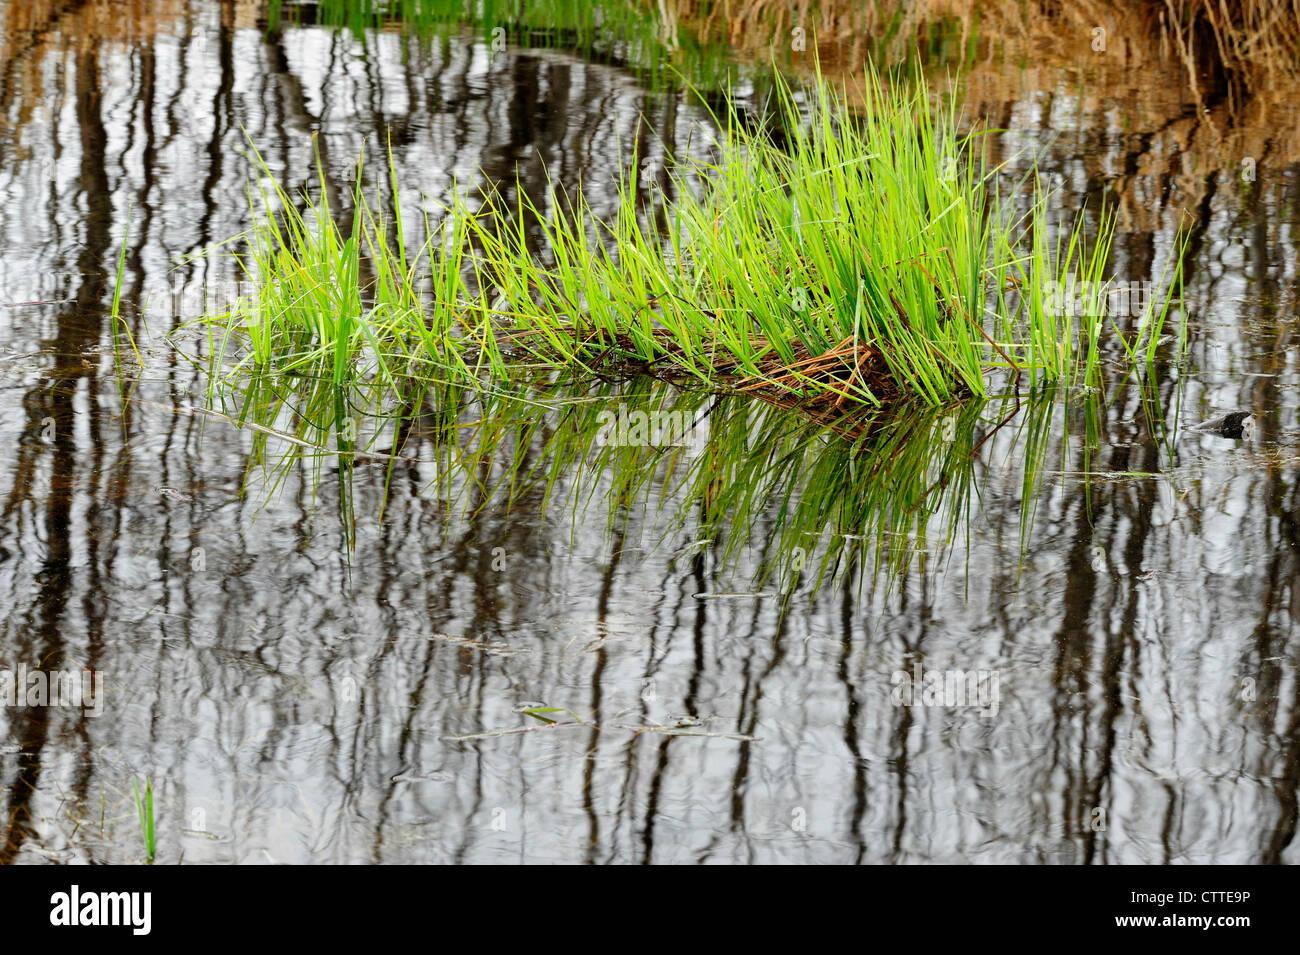 Marsh grasses in beaverpond, Greater Sudbury, Ontario, Canada - Stock Image